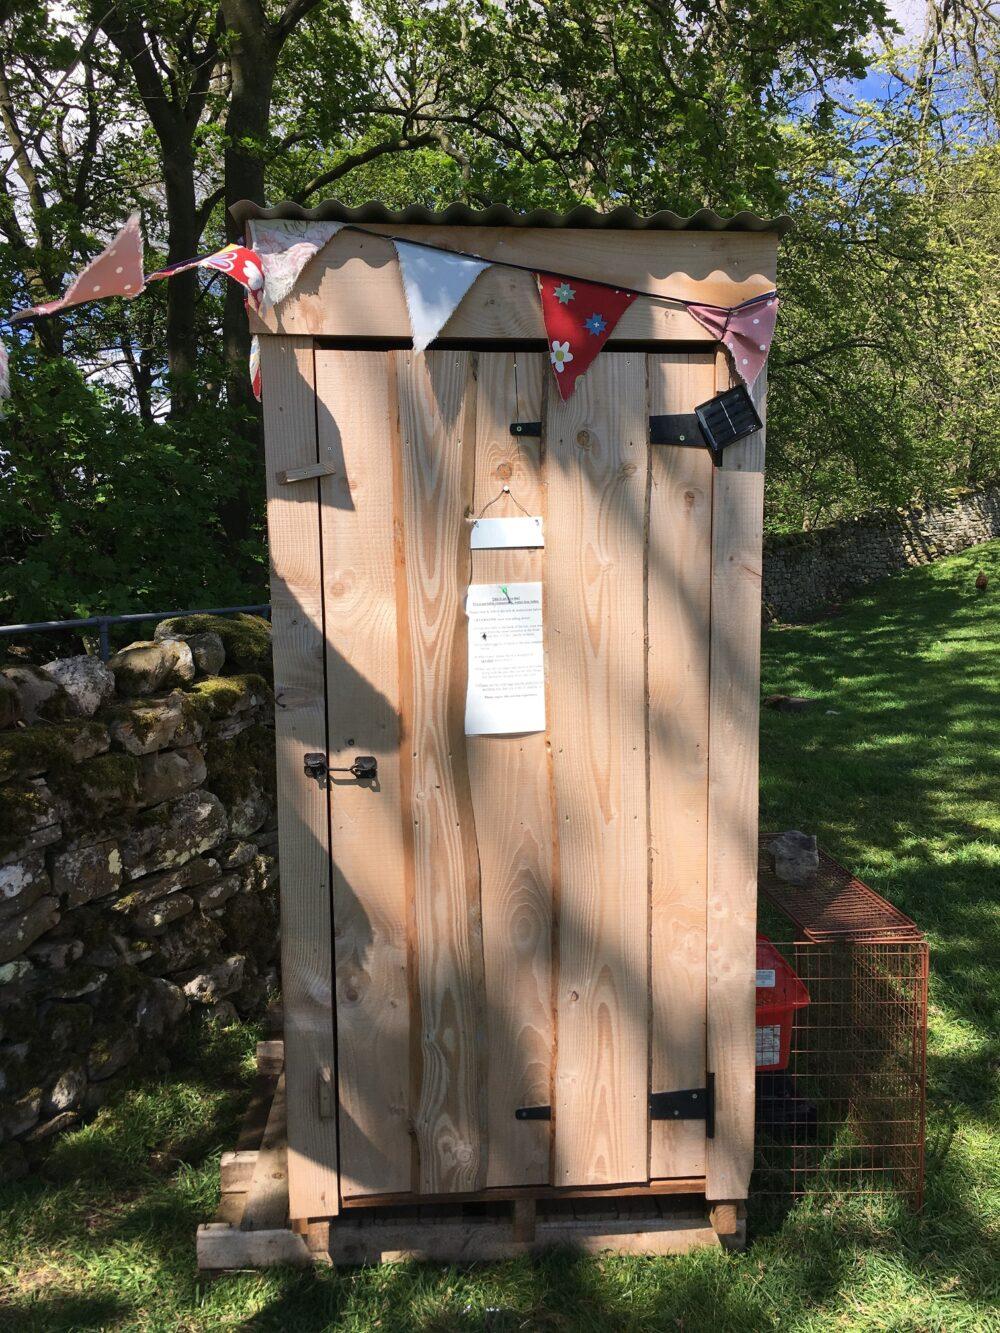 Eco Loo at Askrigg Campsite, Yorkshire Dales